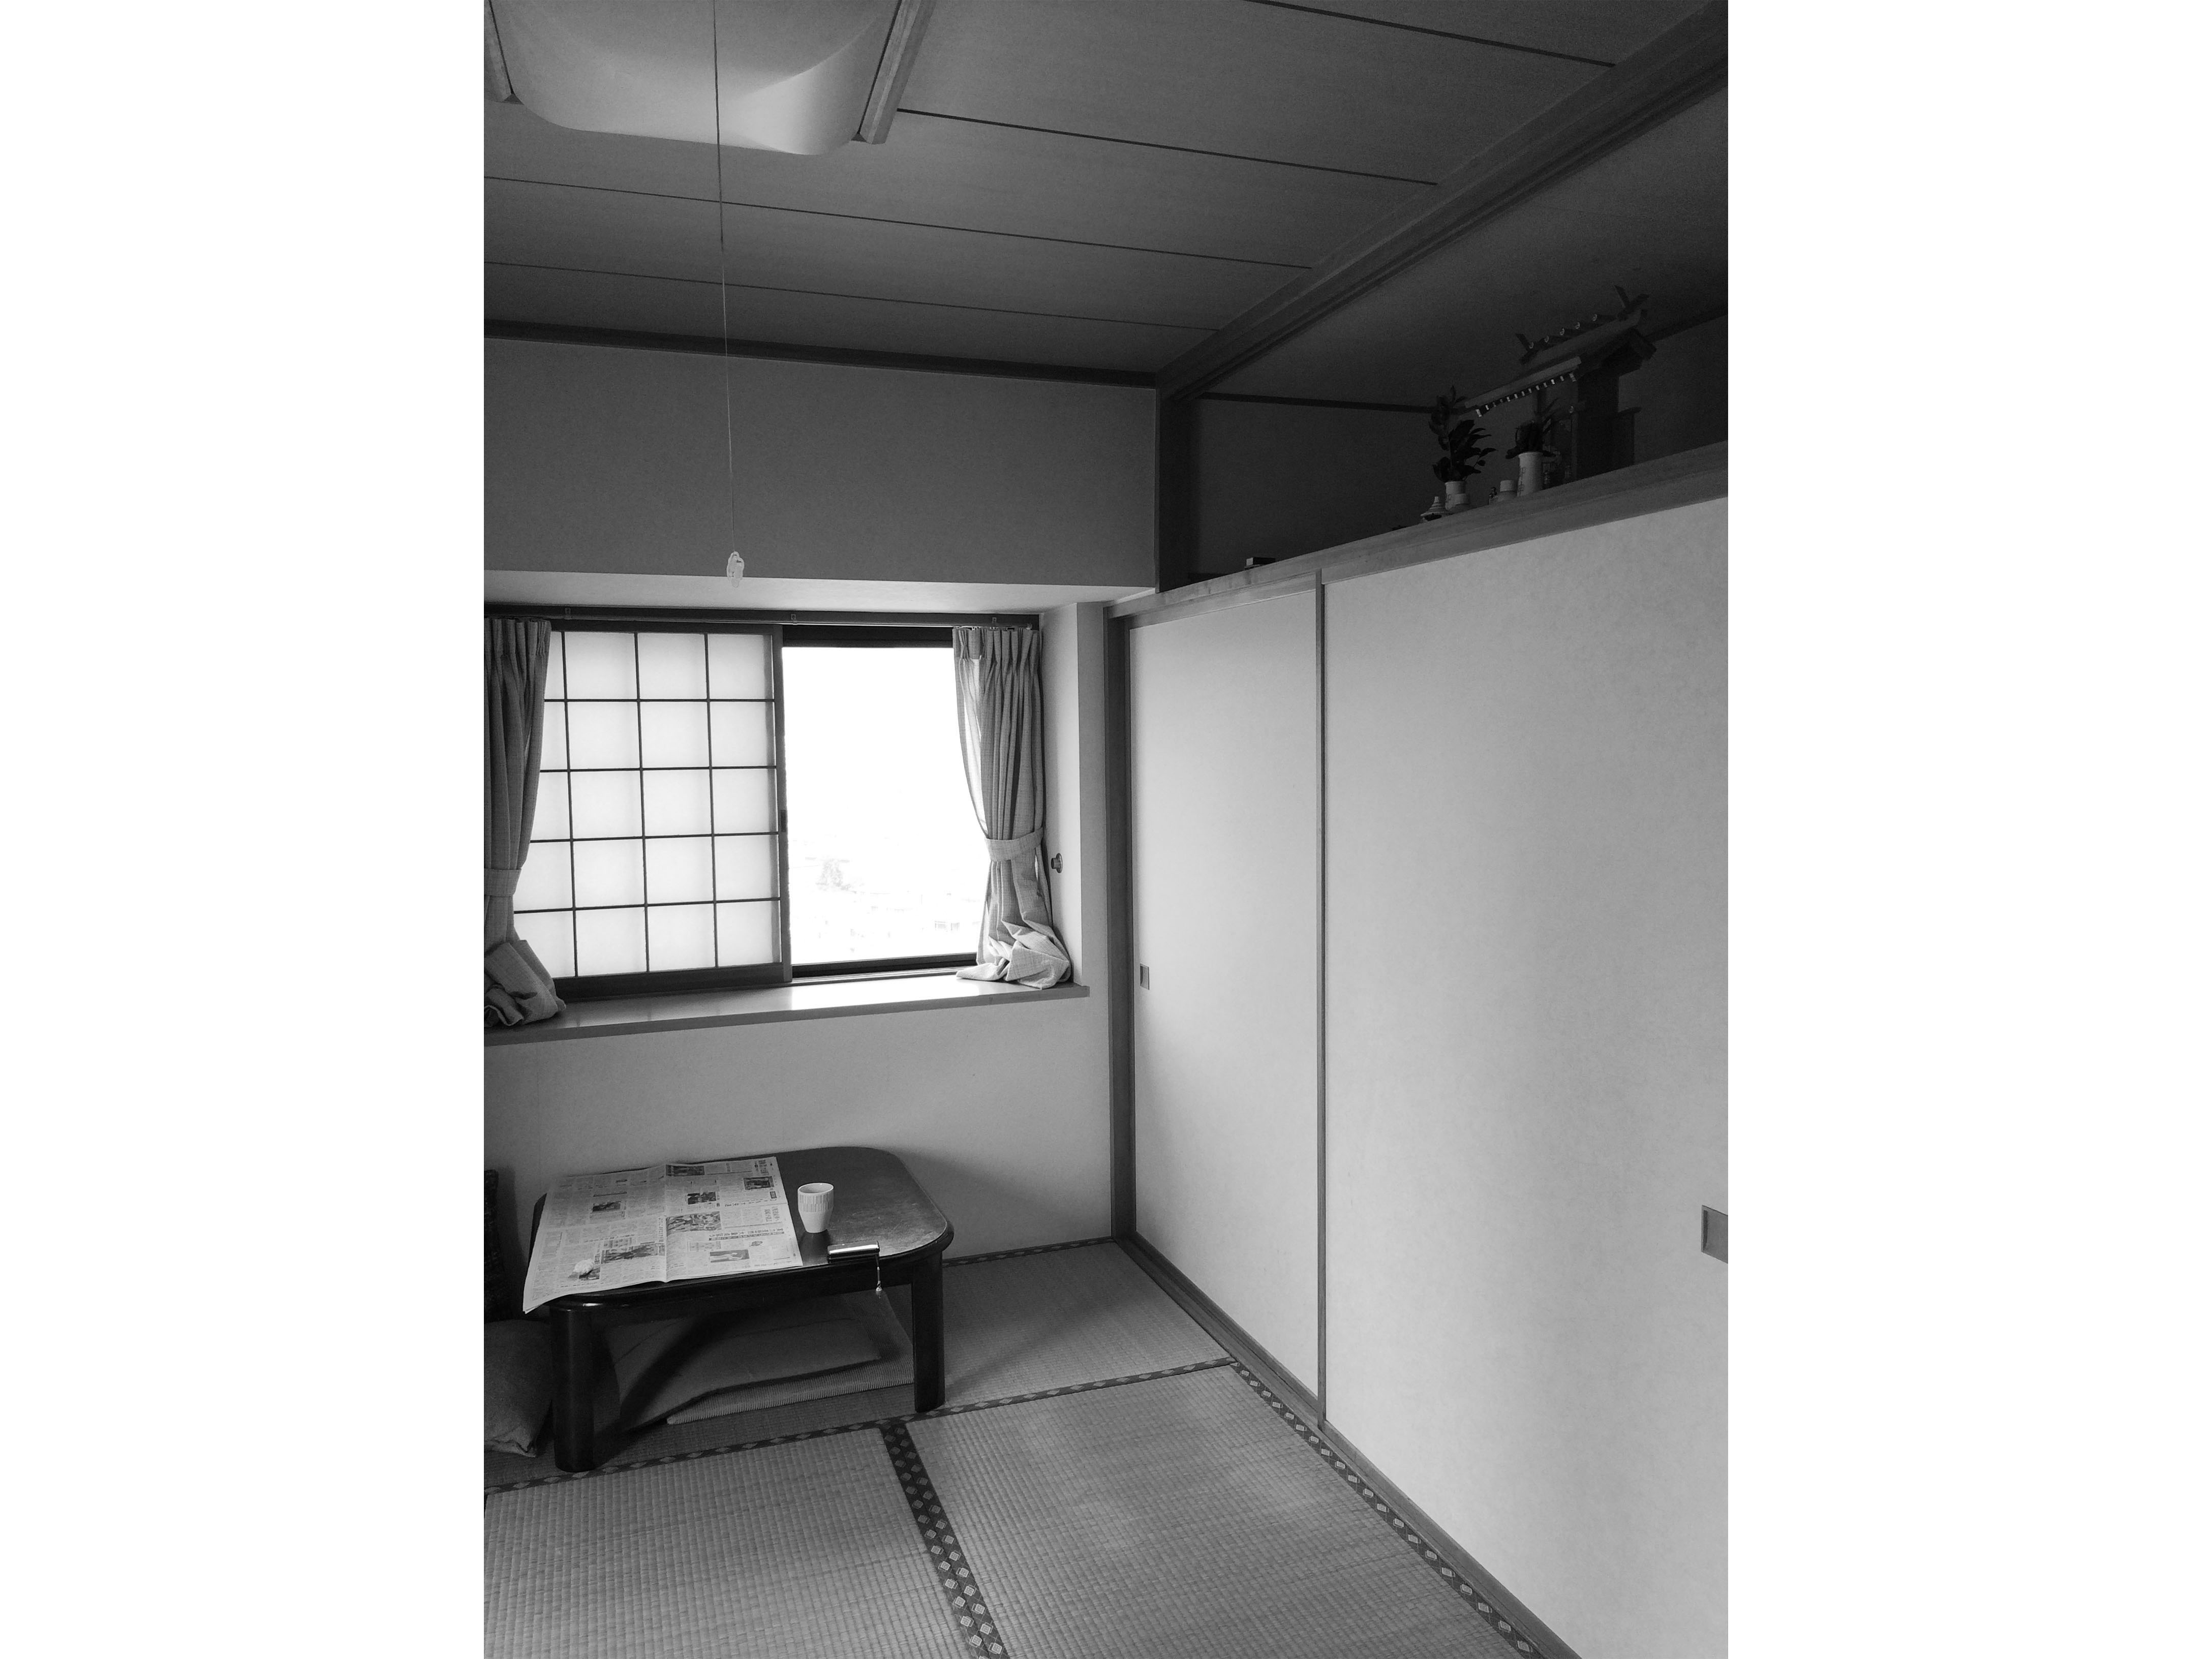 太白区K邸 内装リフォーム 1,118万円/工期60日間 施工前